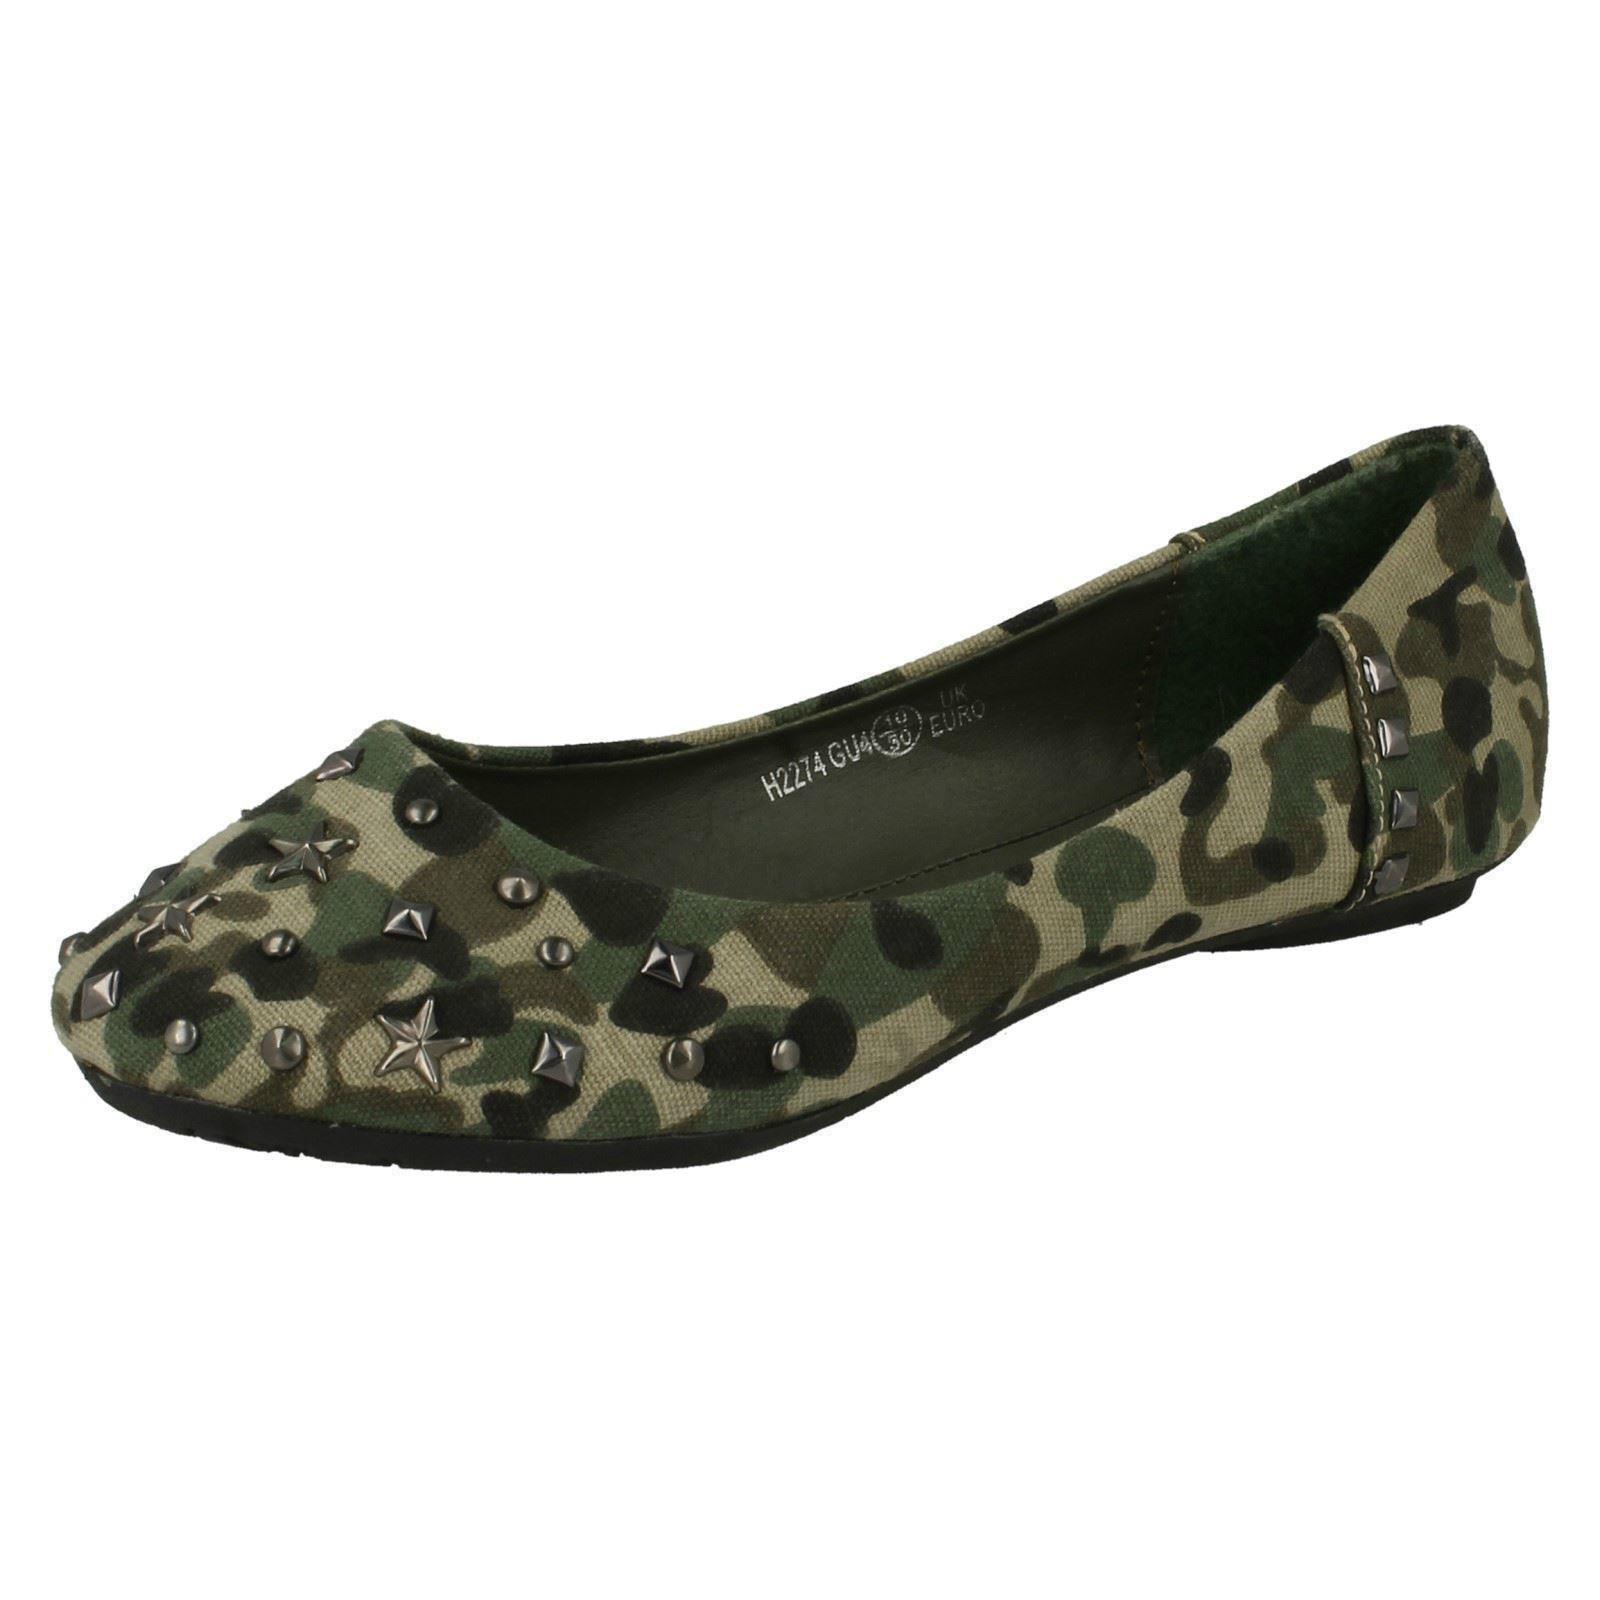 Chicas Bailarina Zapatos informales de punto en H2274